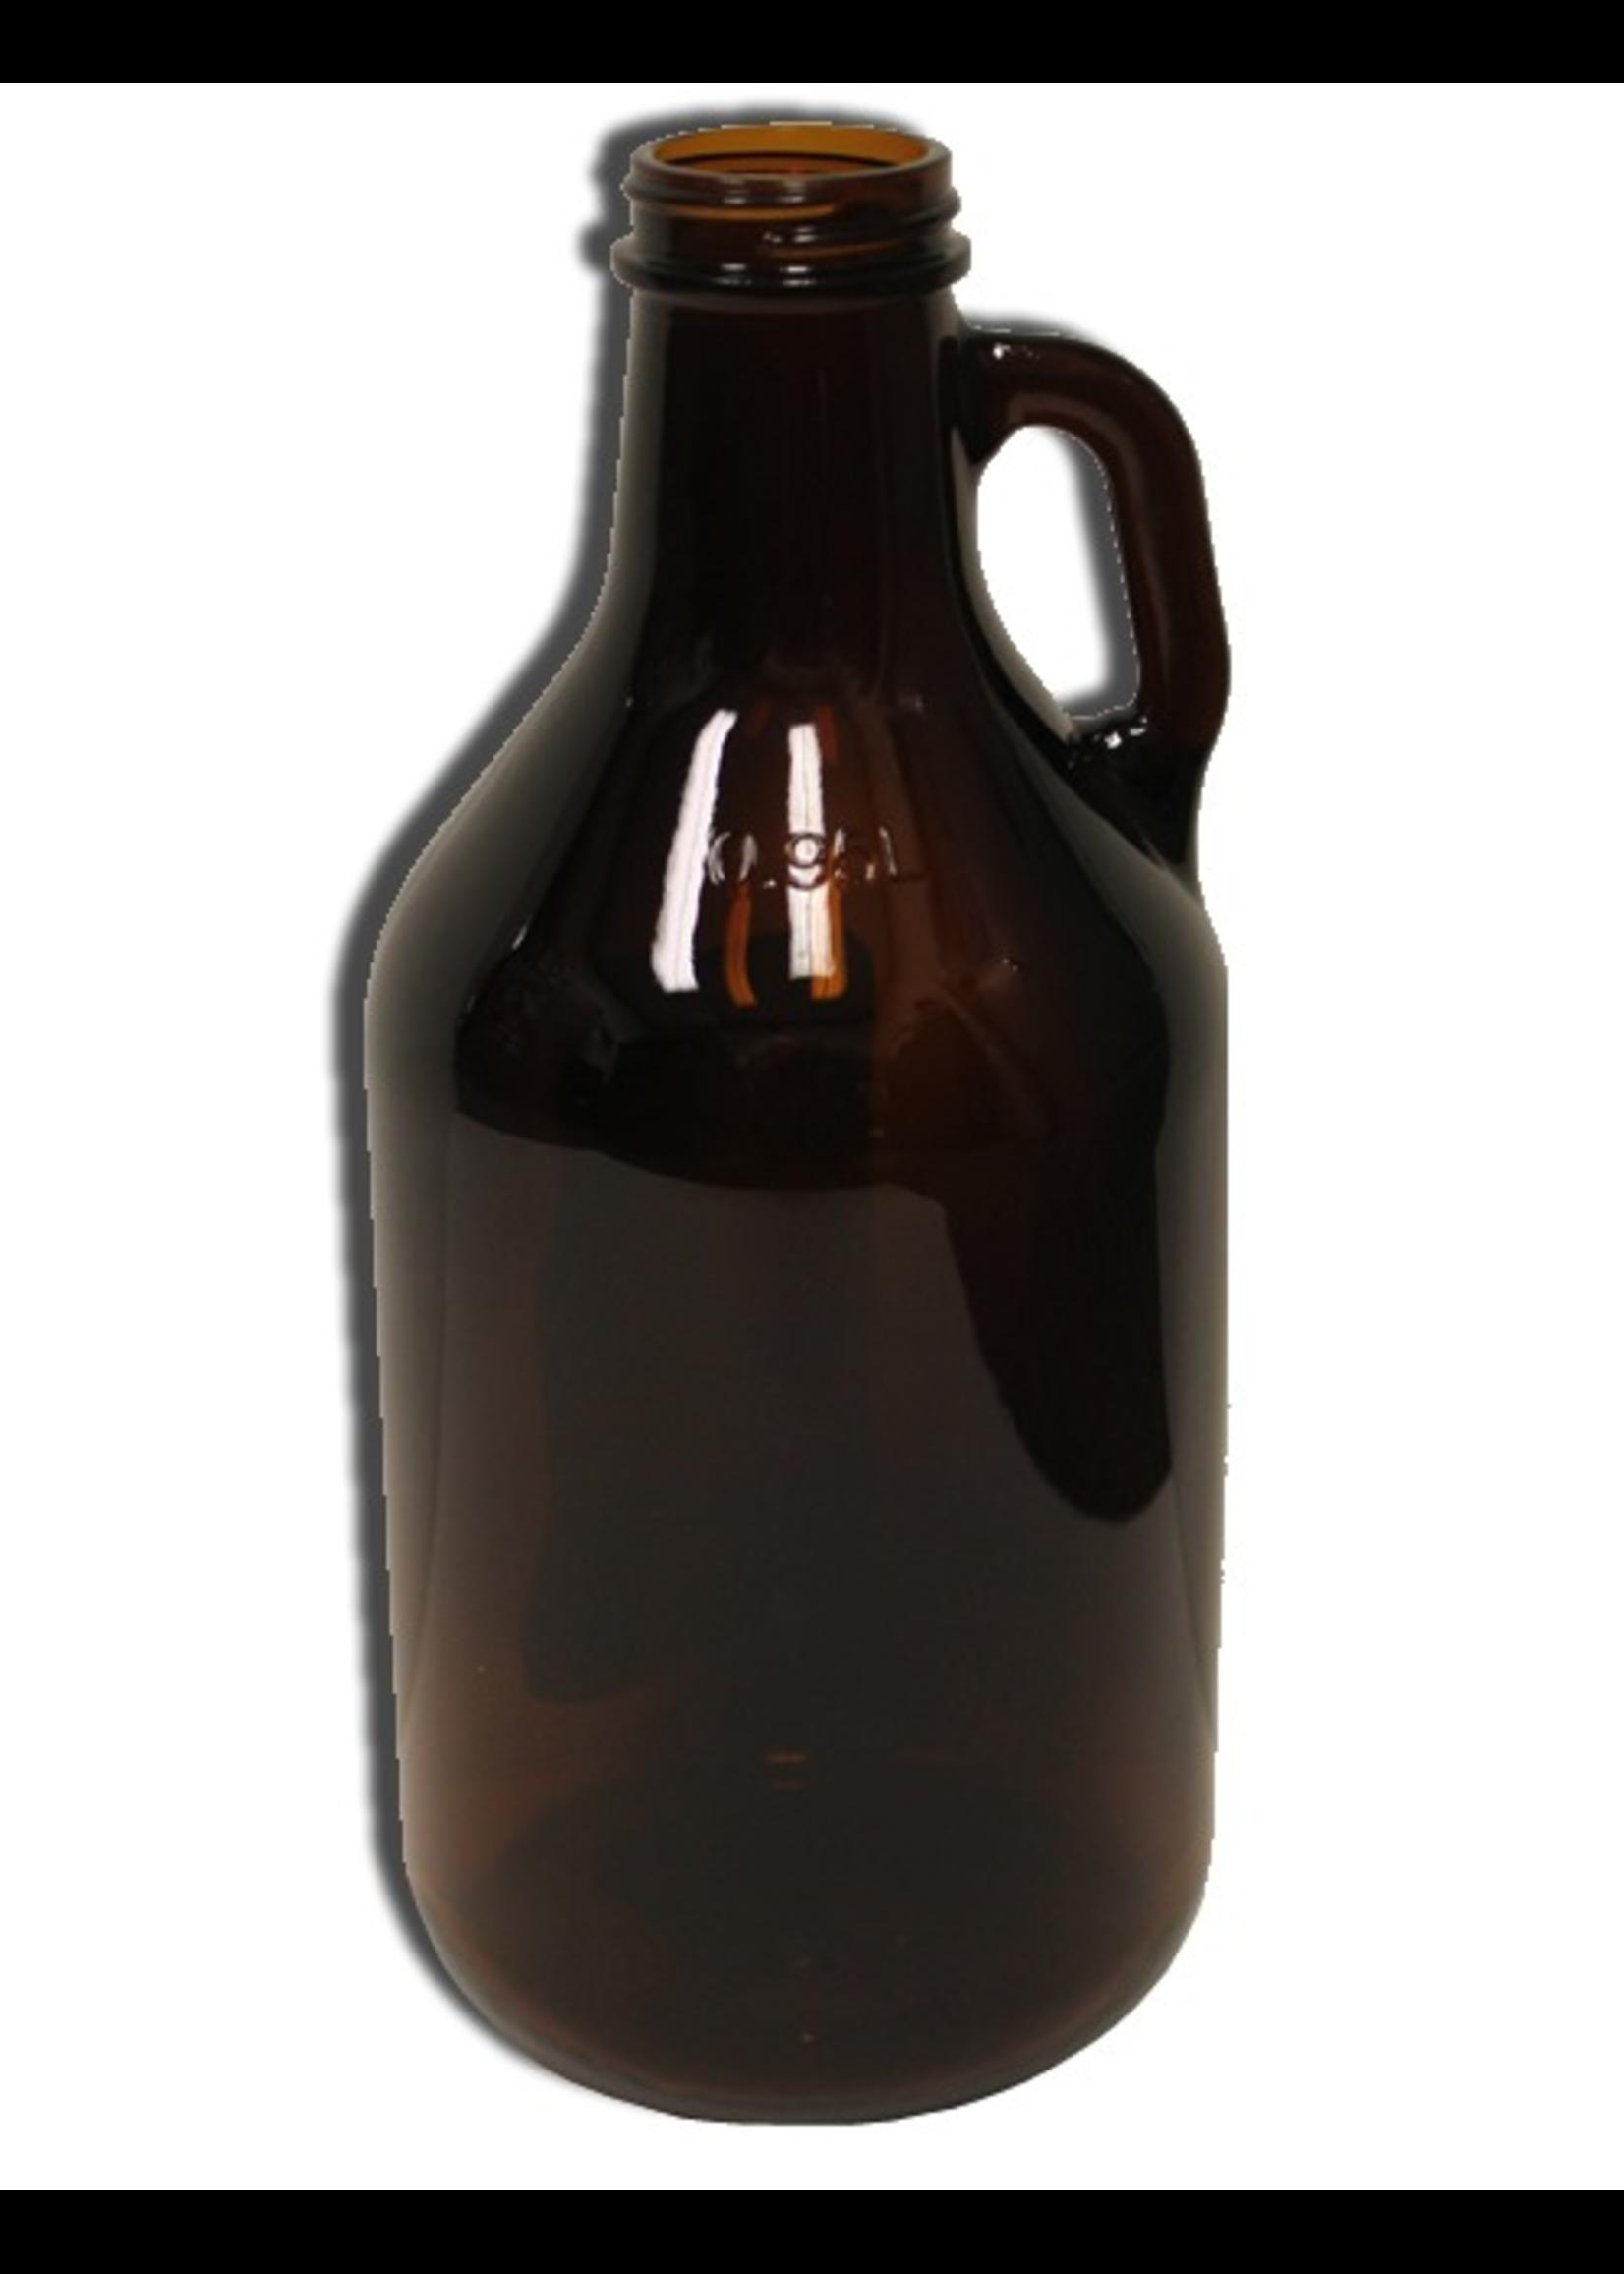 Racking/Bottling Glass Jug - Amber 1/4 Gallon Glass Growler with Handle (1/each)